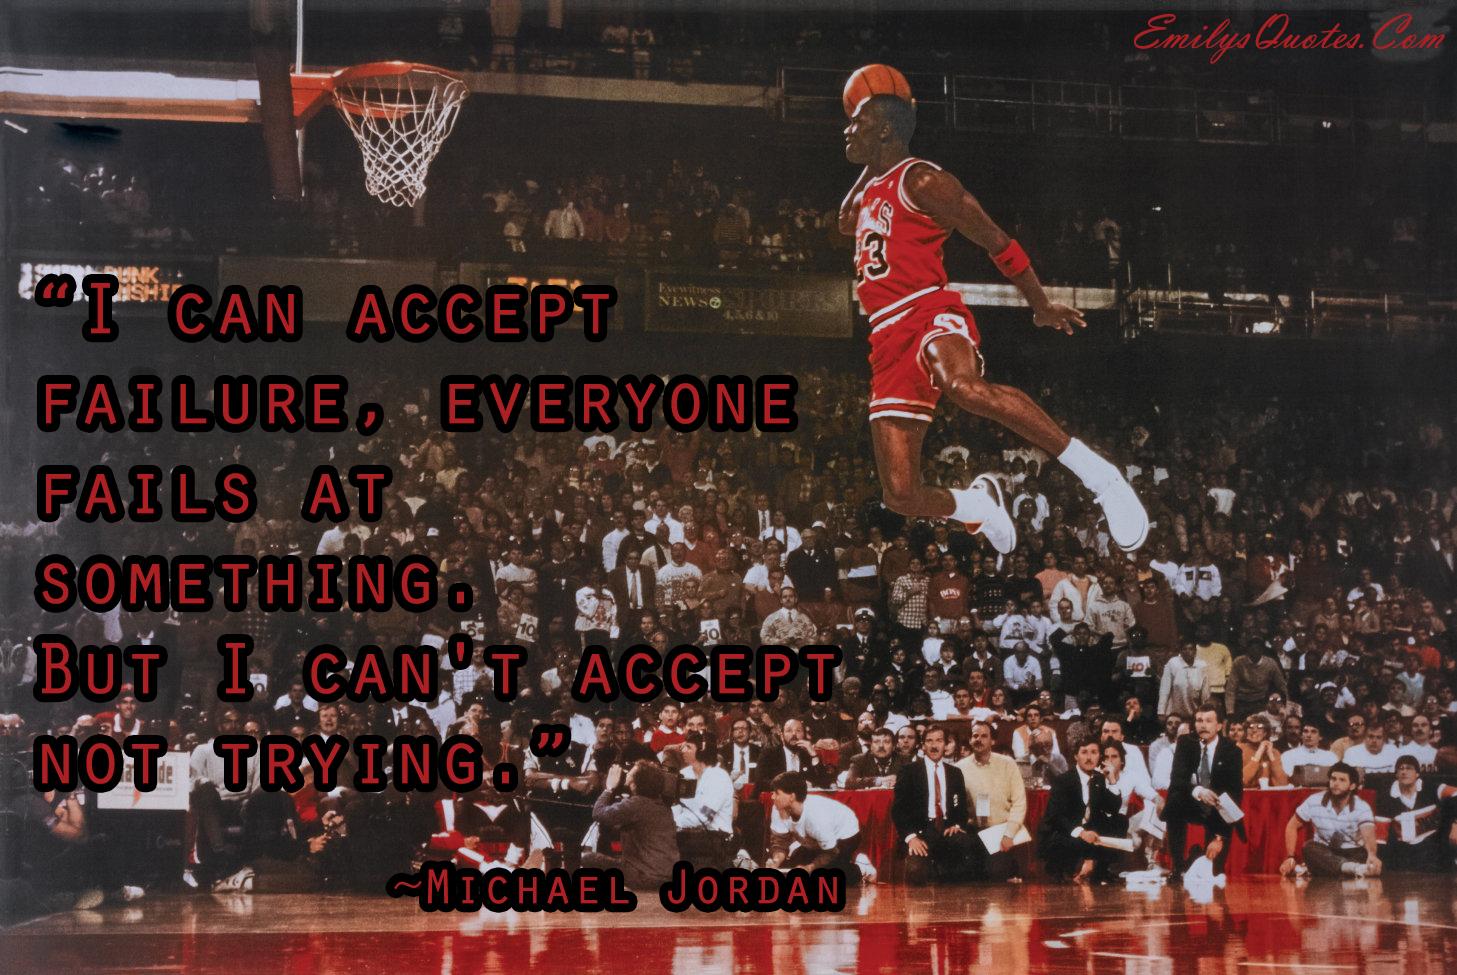 EmilysQuotes.Com - inspirational, motivational, great, Michael Jordan, failure